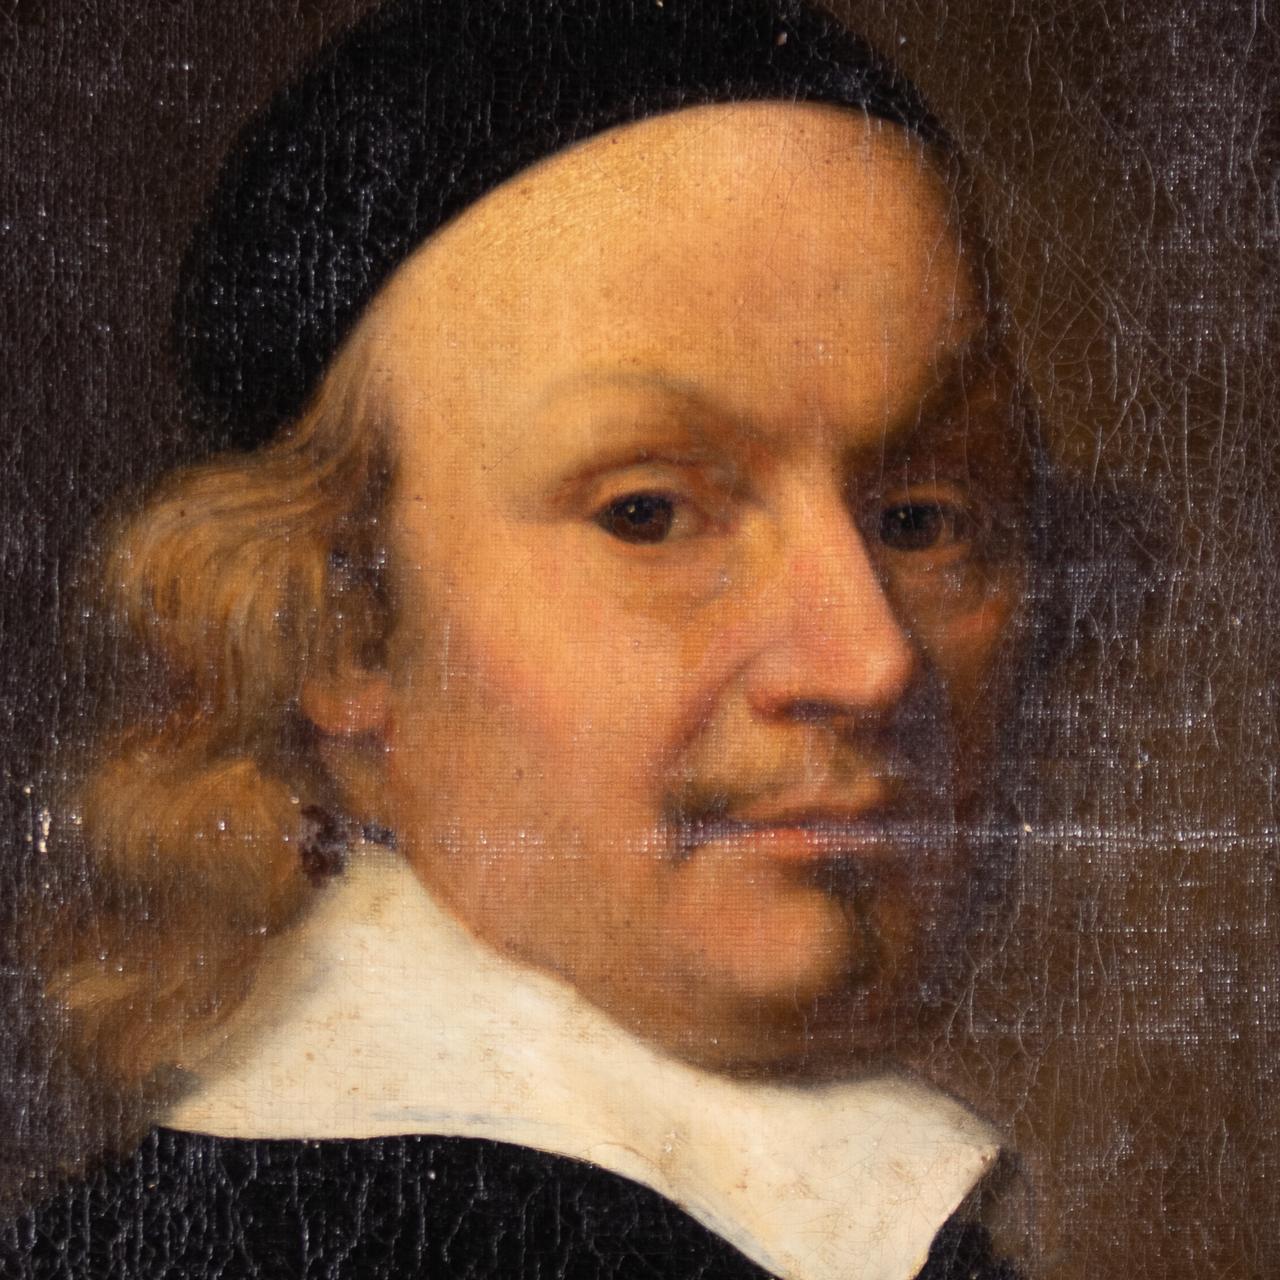 XVII Old Master Portrait - Cardinal - Image 11 of 12